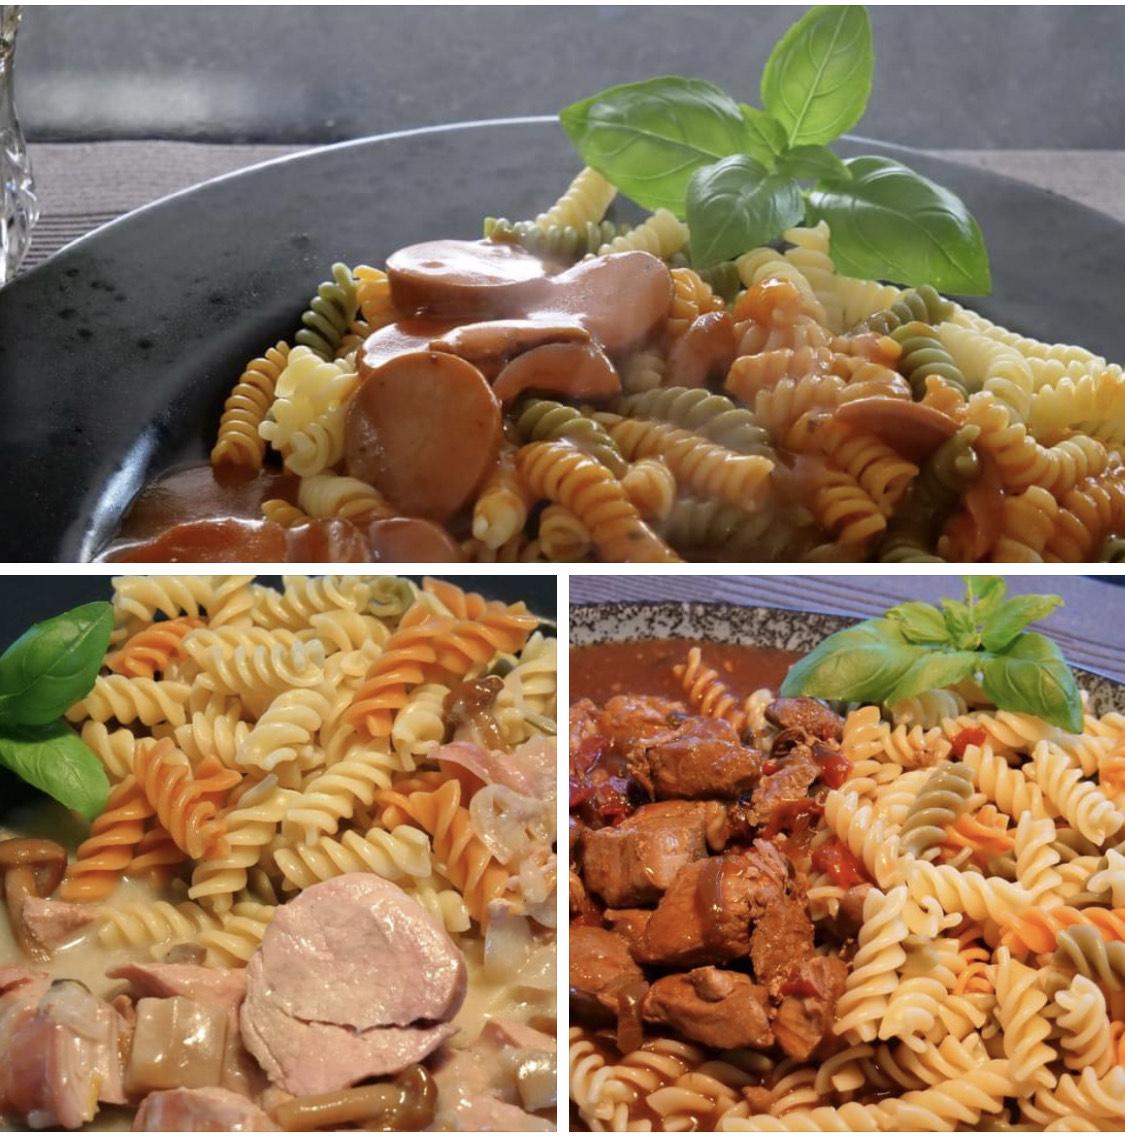 Malomy.de - 15% Rabatt auf Nudelgerichte